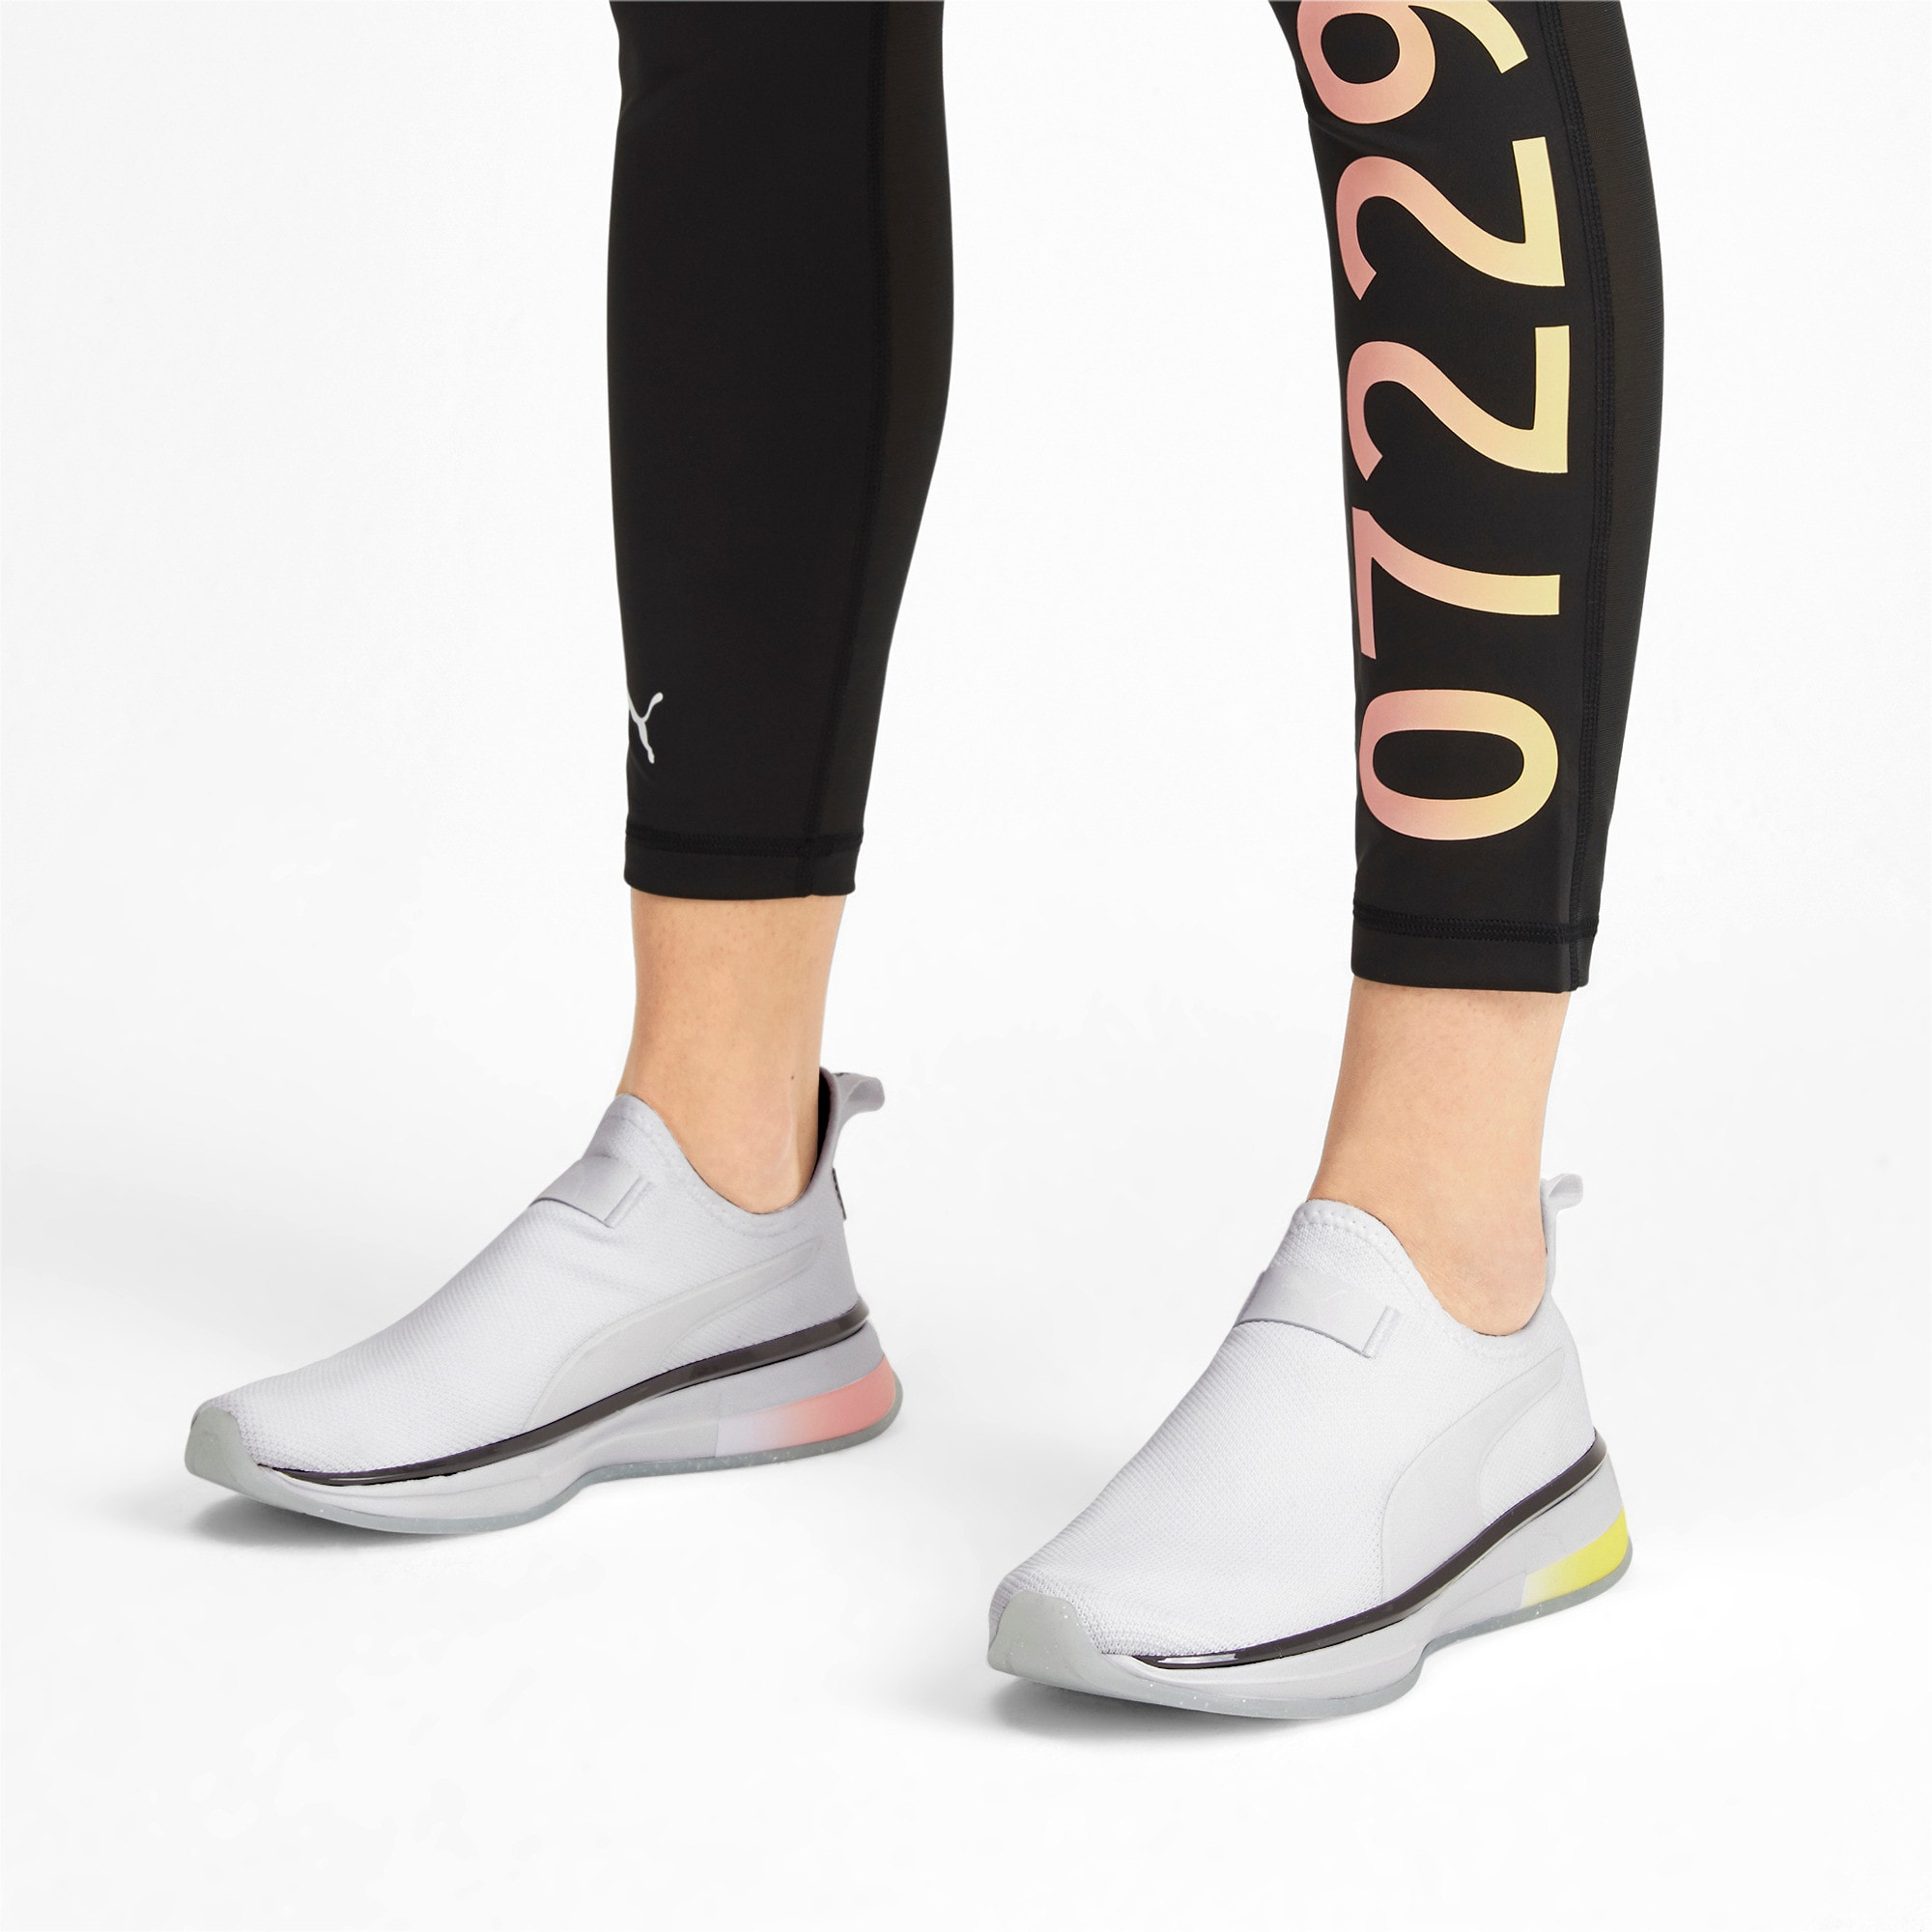 Miniatura 2 de Zapatos de entrenamiento SG Slip-On Glitz para mujer, Puma White-Puma Black, mediano